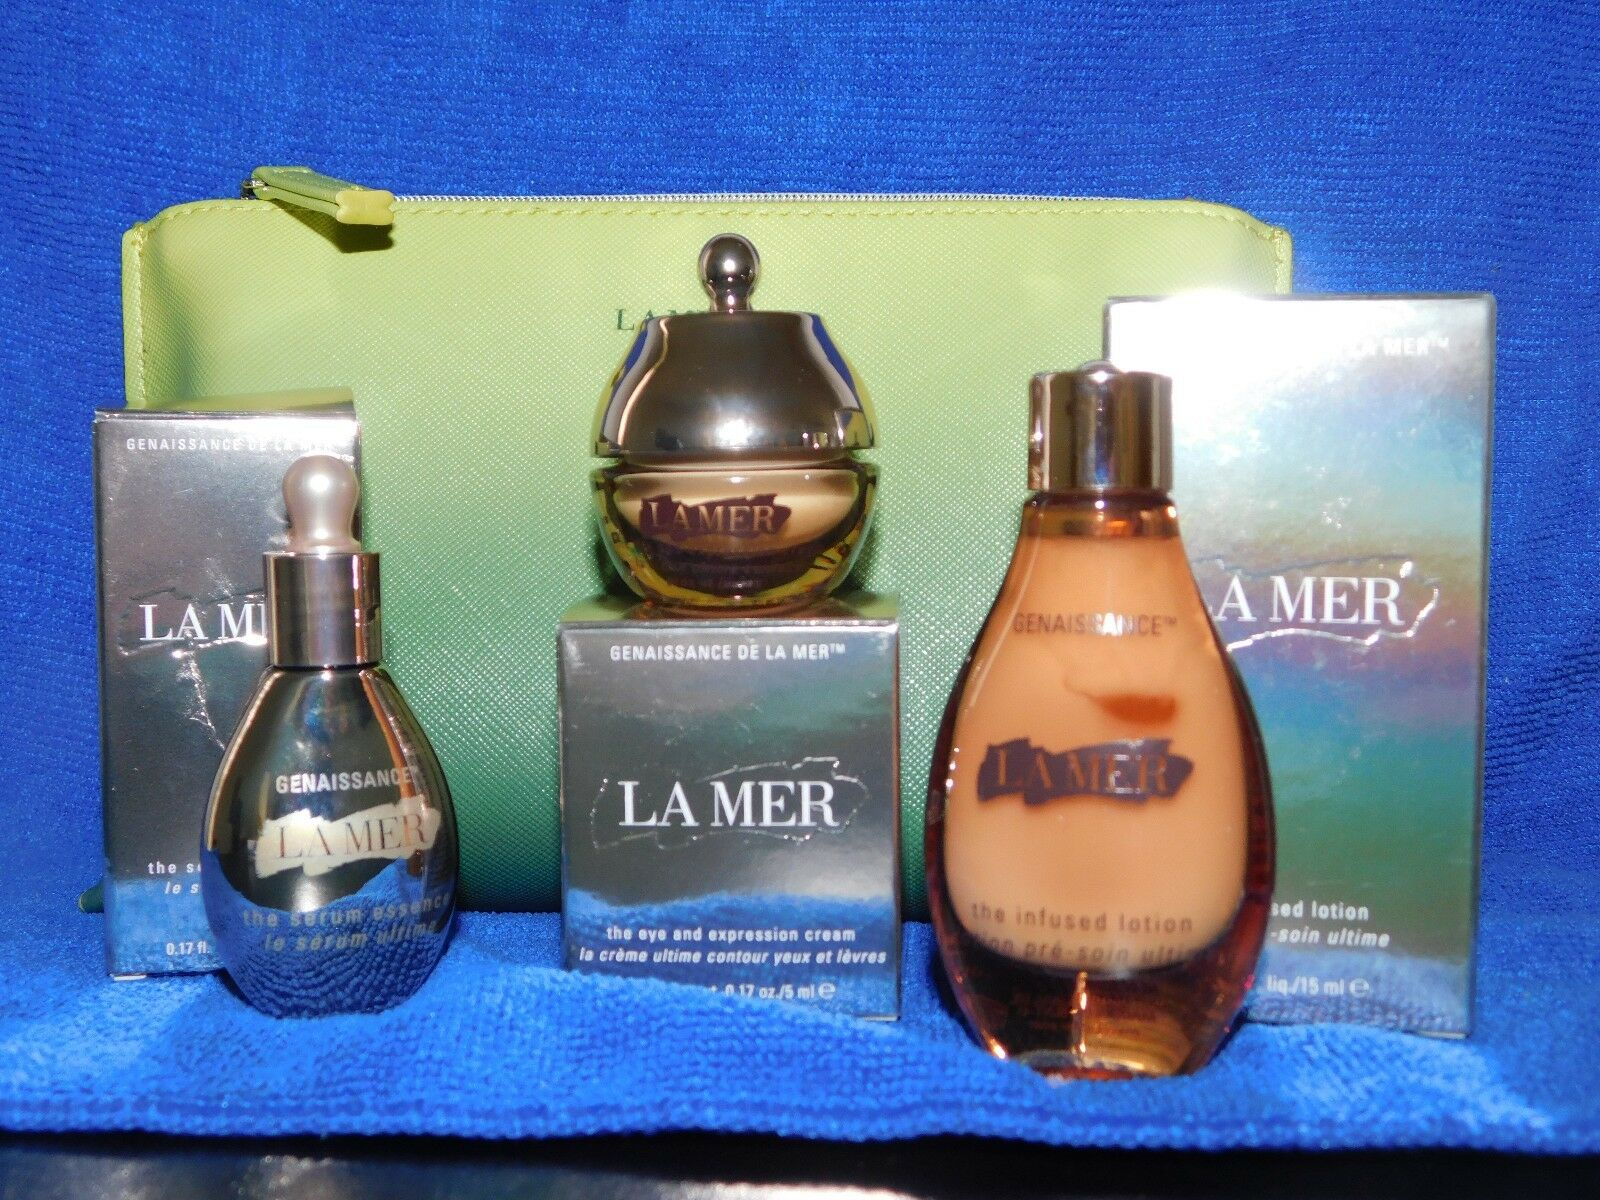 La Mer Genaissance Travel Set Eye Cream Lotion Serum 2018-19